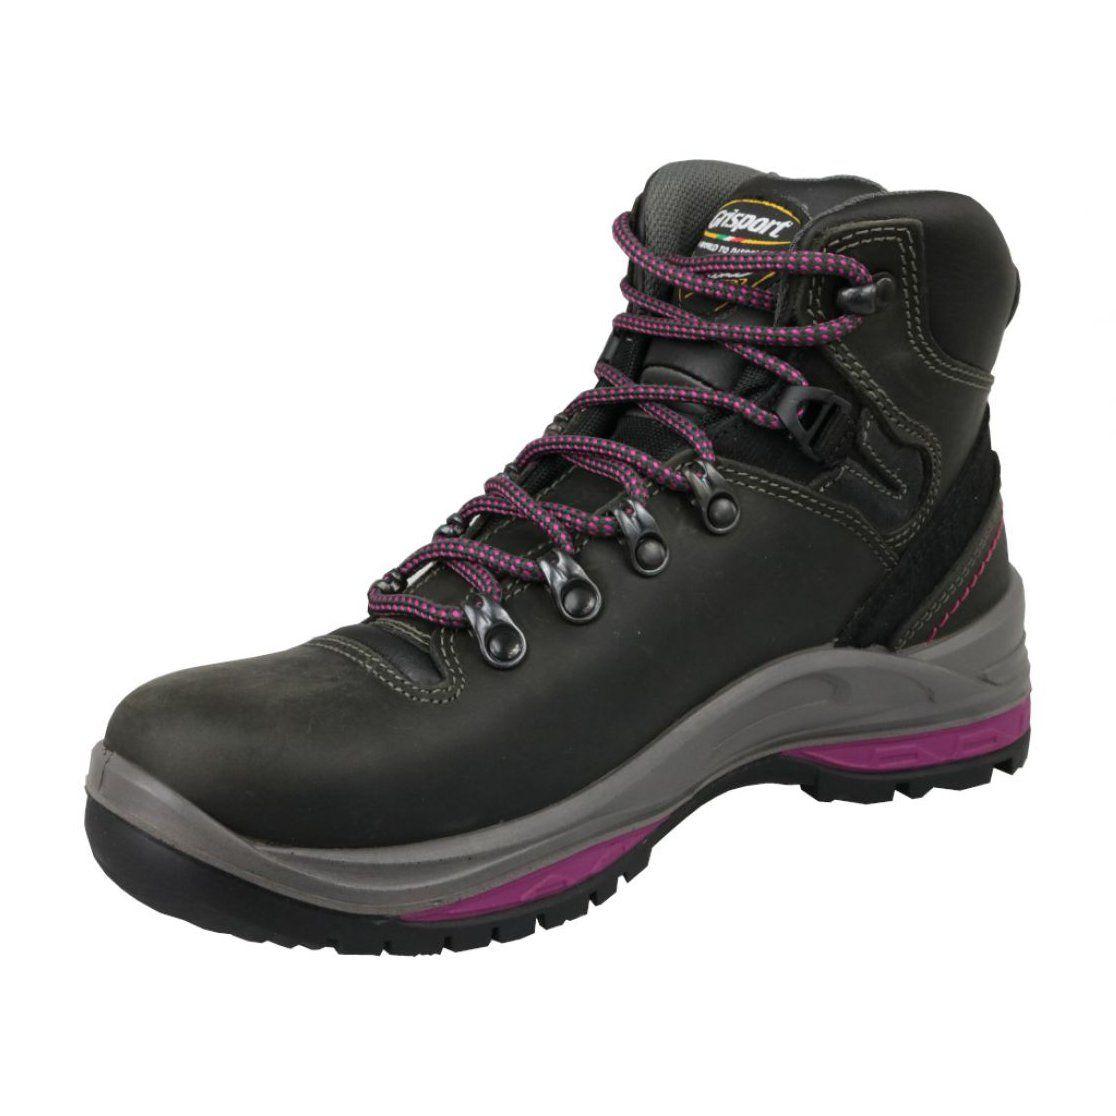 Grisport Grigio W 13503d30g Shoes Brown Sport Shoes Women Hiking Boots Women Hiking Women